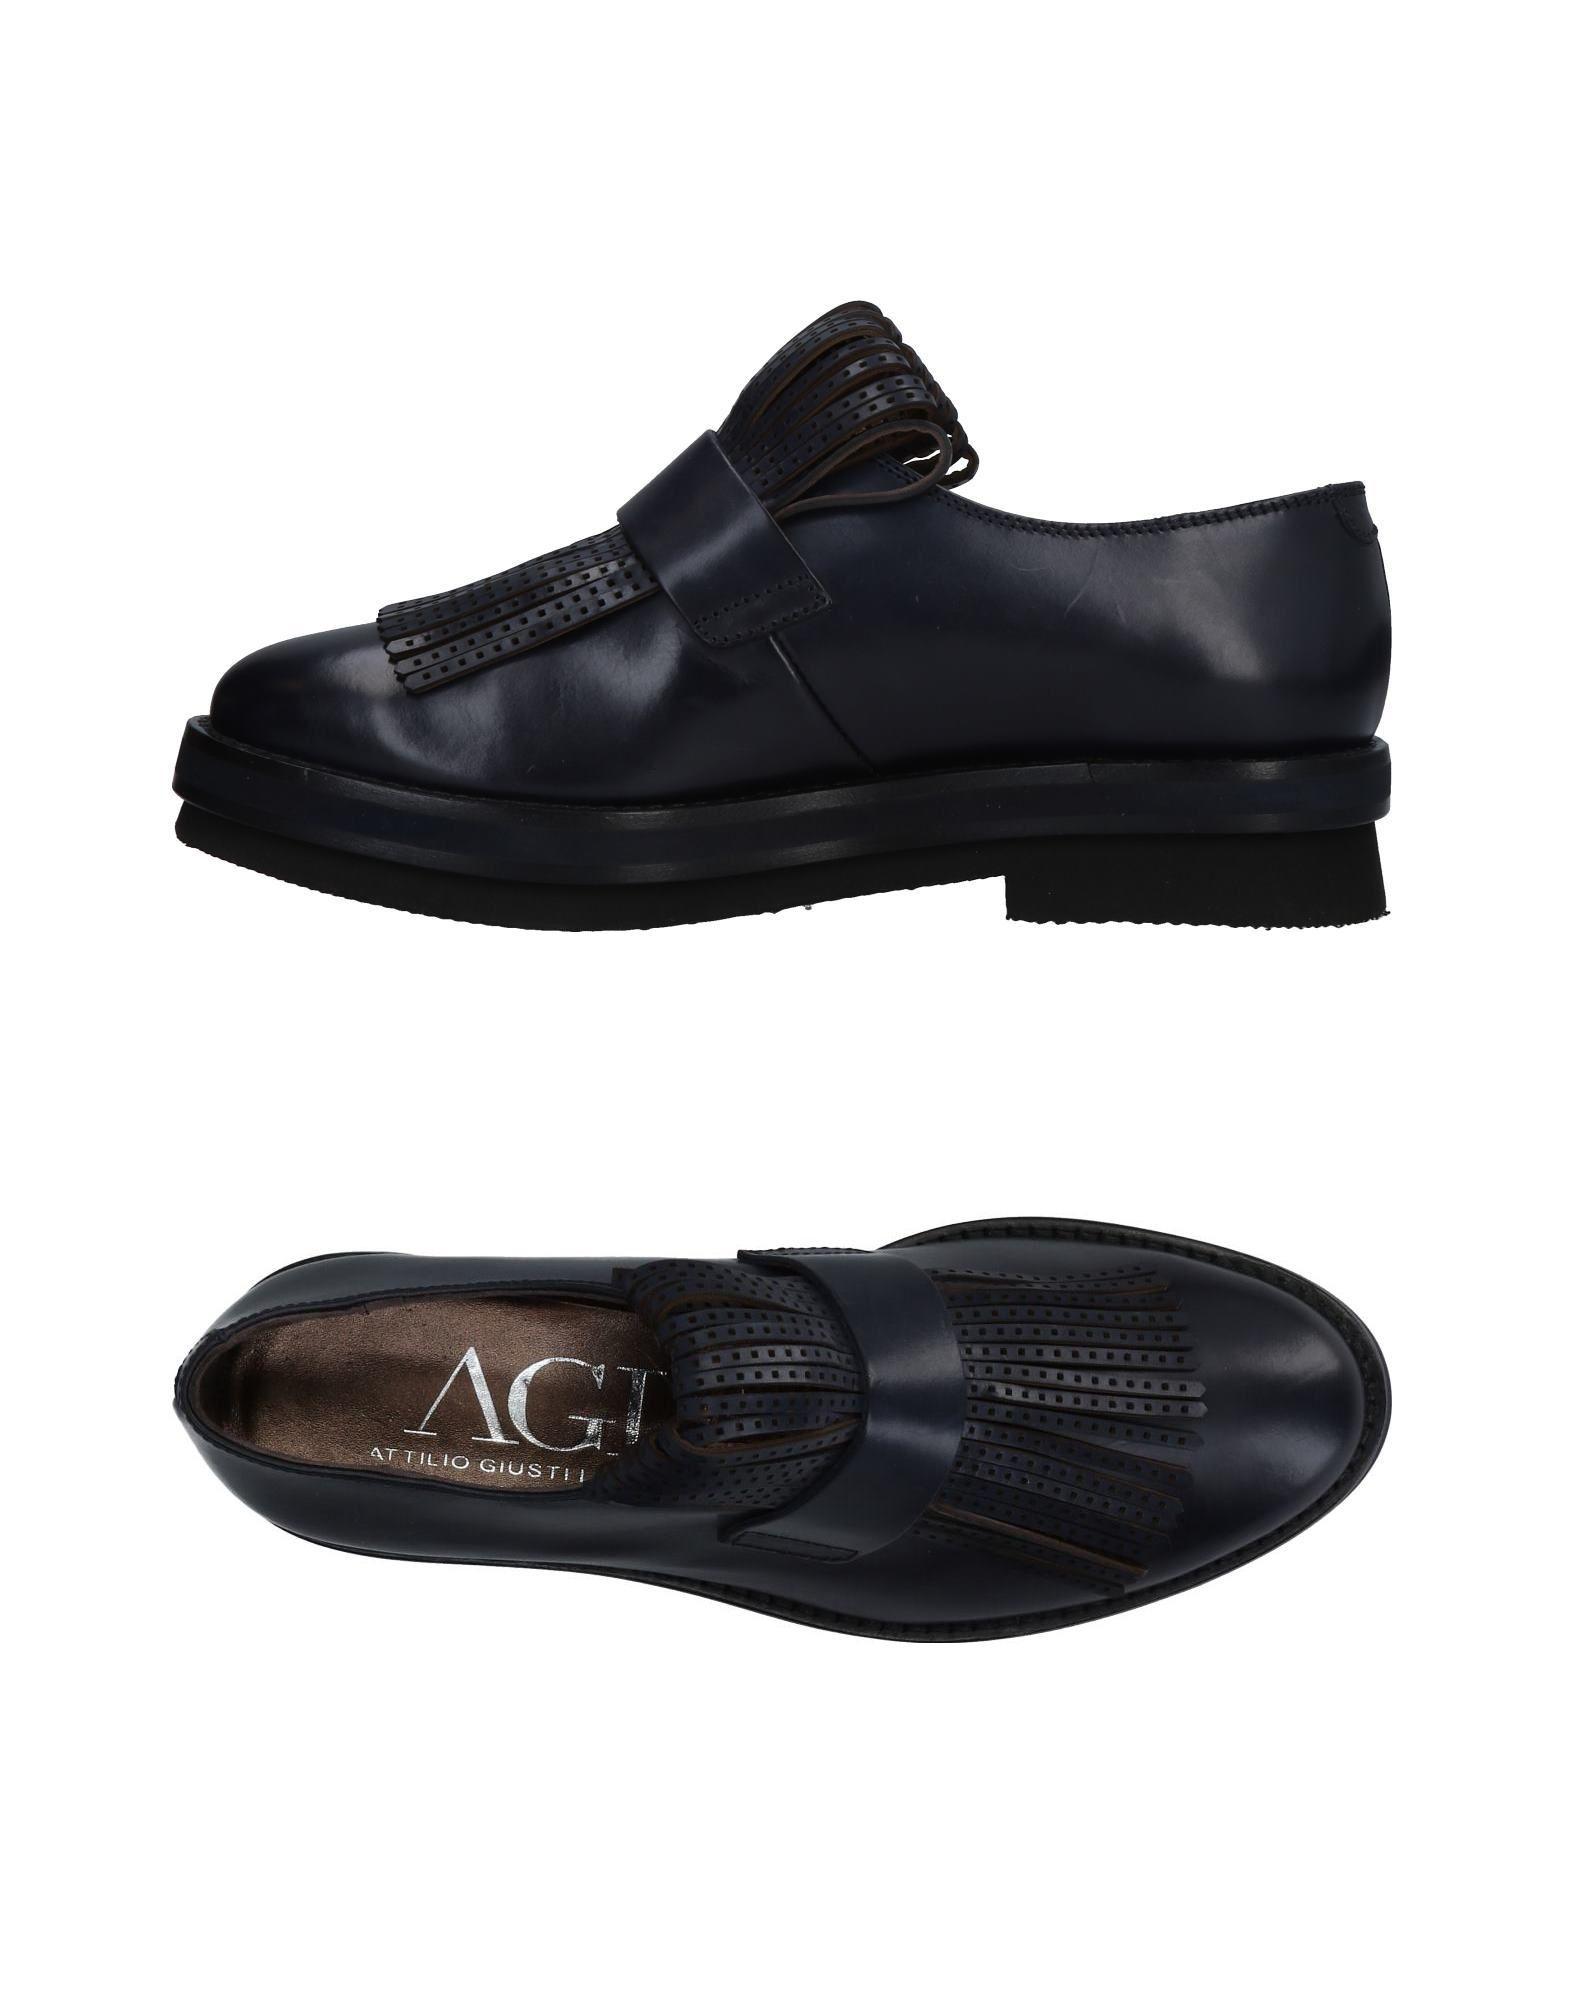 Agl Attilio Giusti Leombruni Mokassins Damen  11470136WP Heiße Schuhe